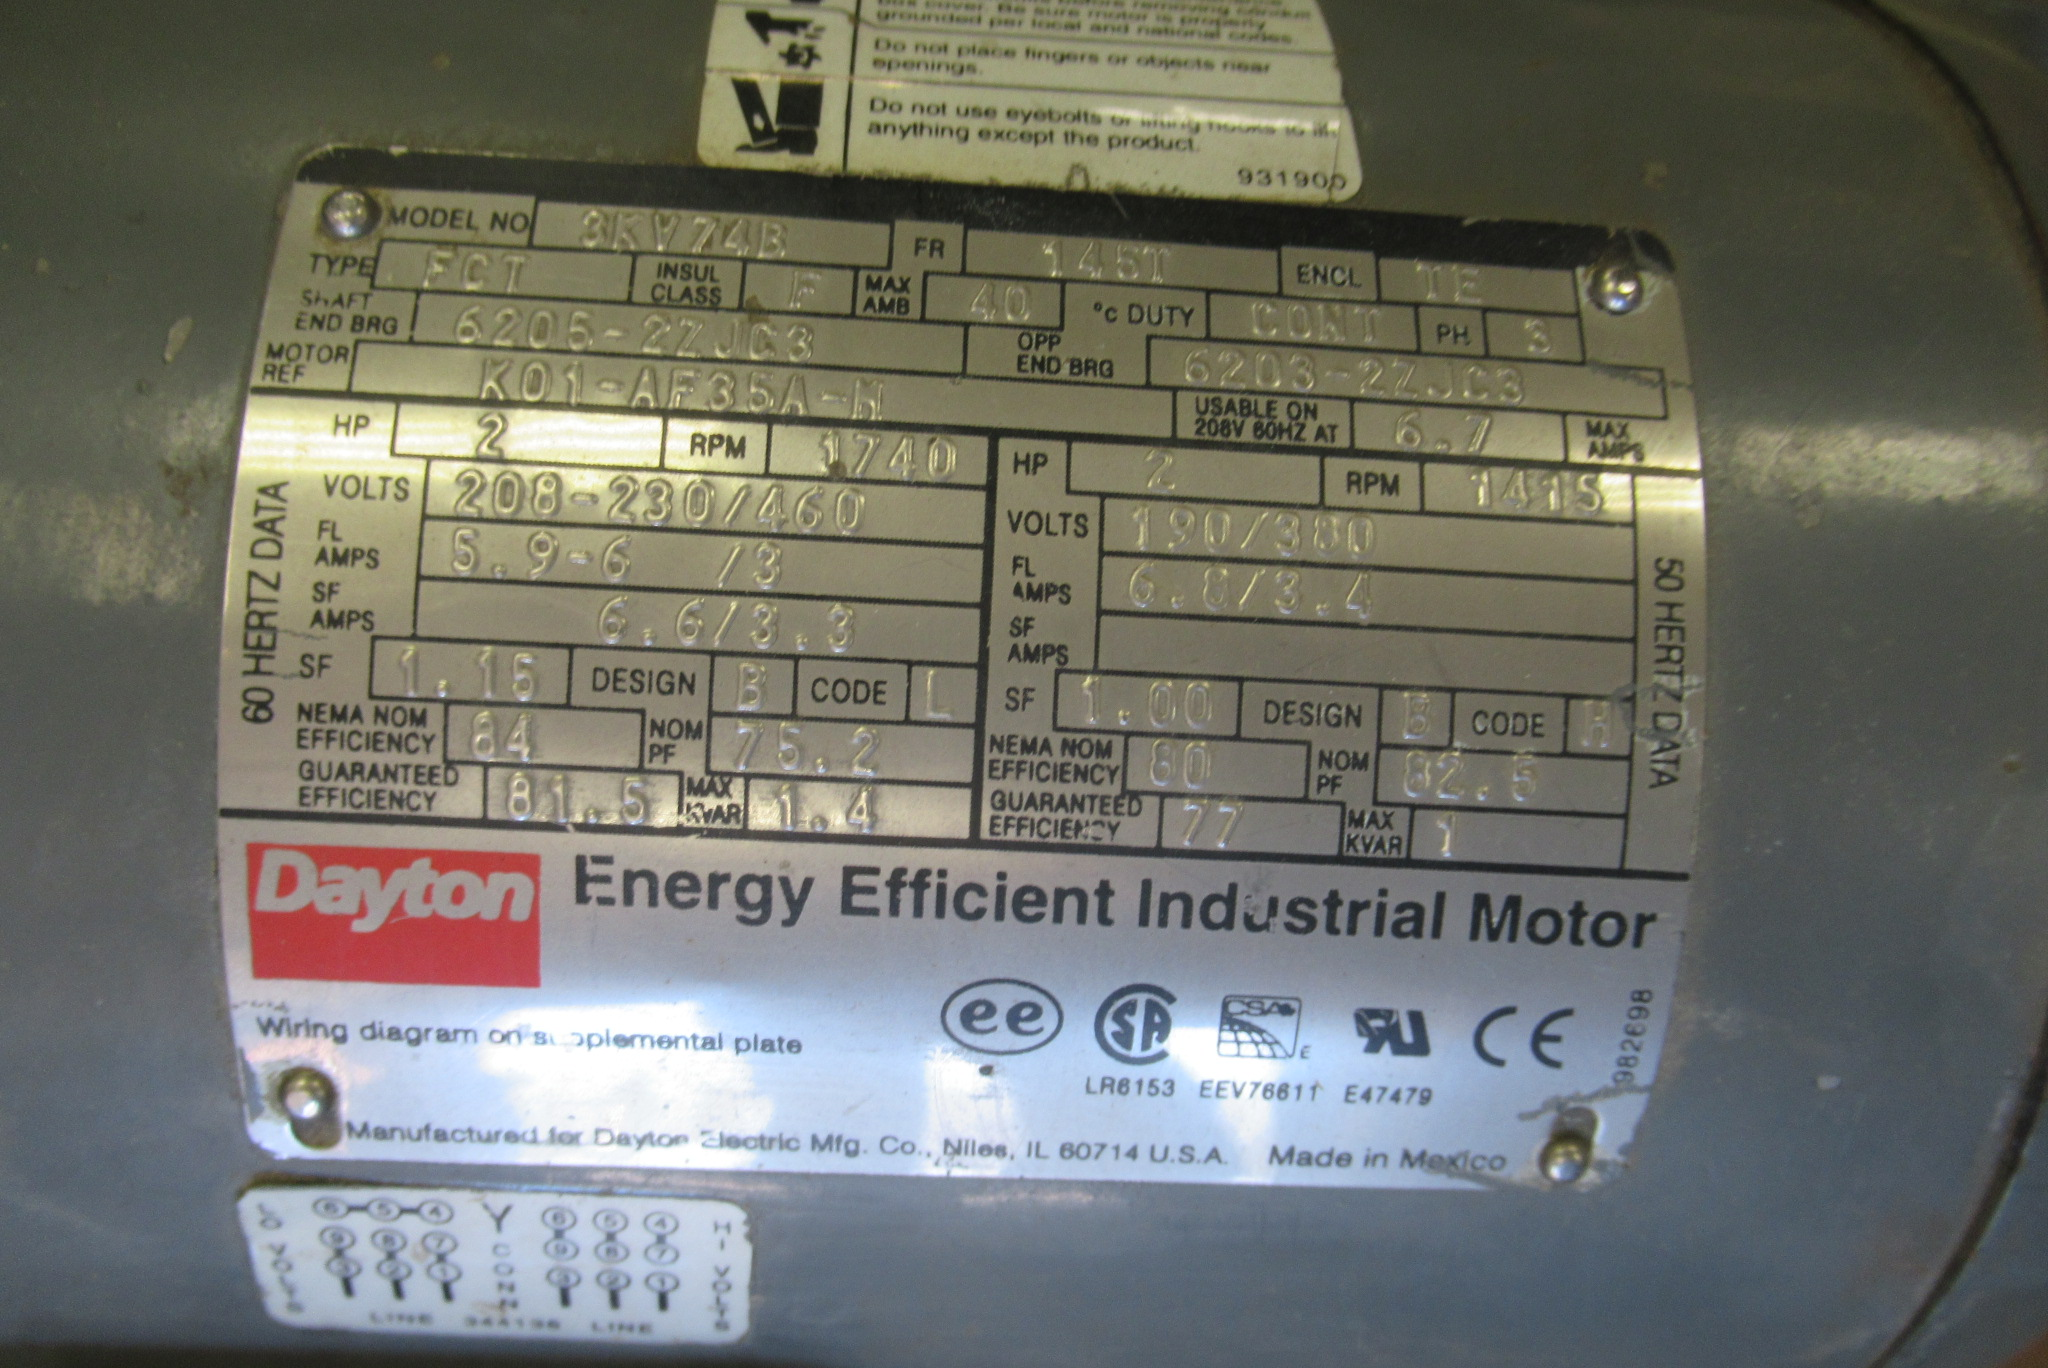 Lot 51 - Dayton Single Phase 2 Hp Motor, 220V, m/n 3KV74B